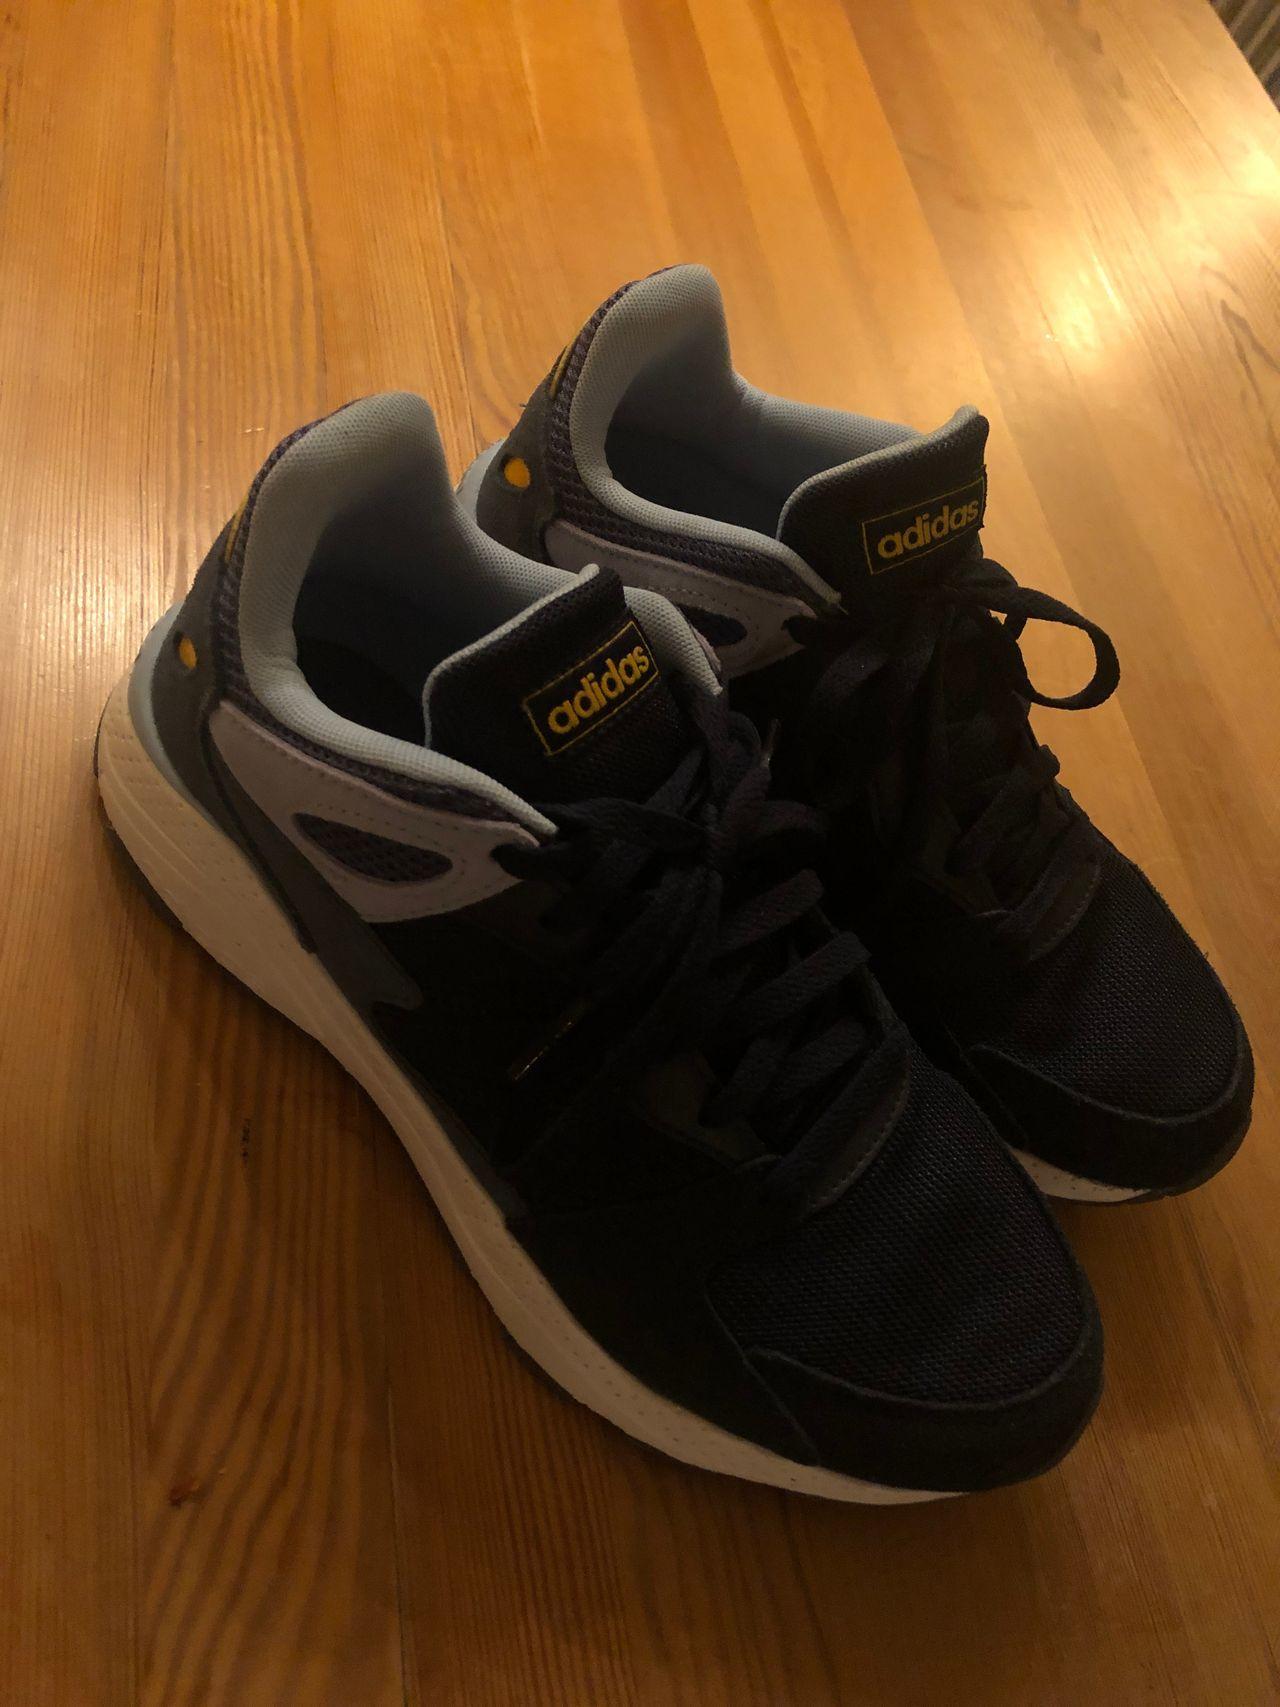 Adidas fritidssko   FINN.no